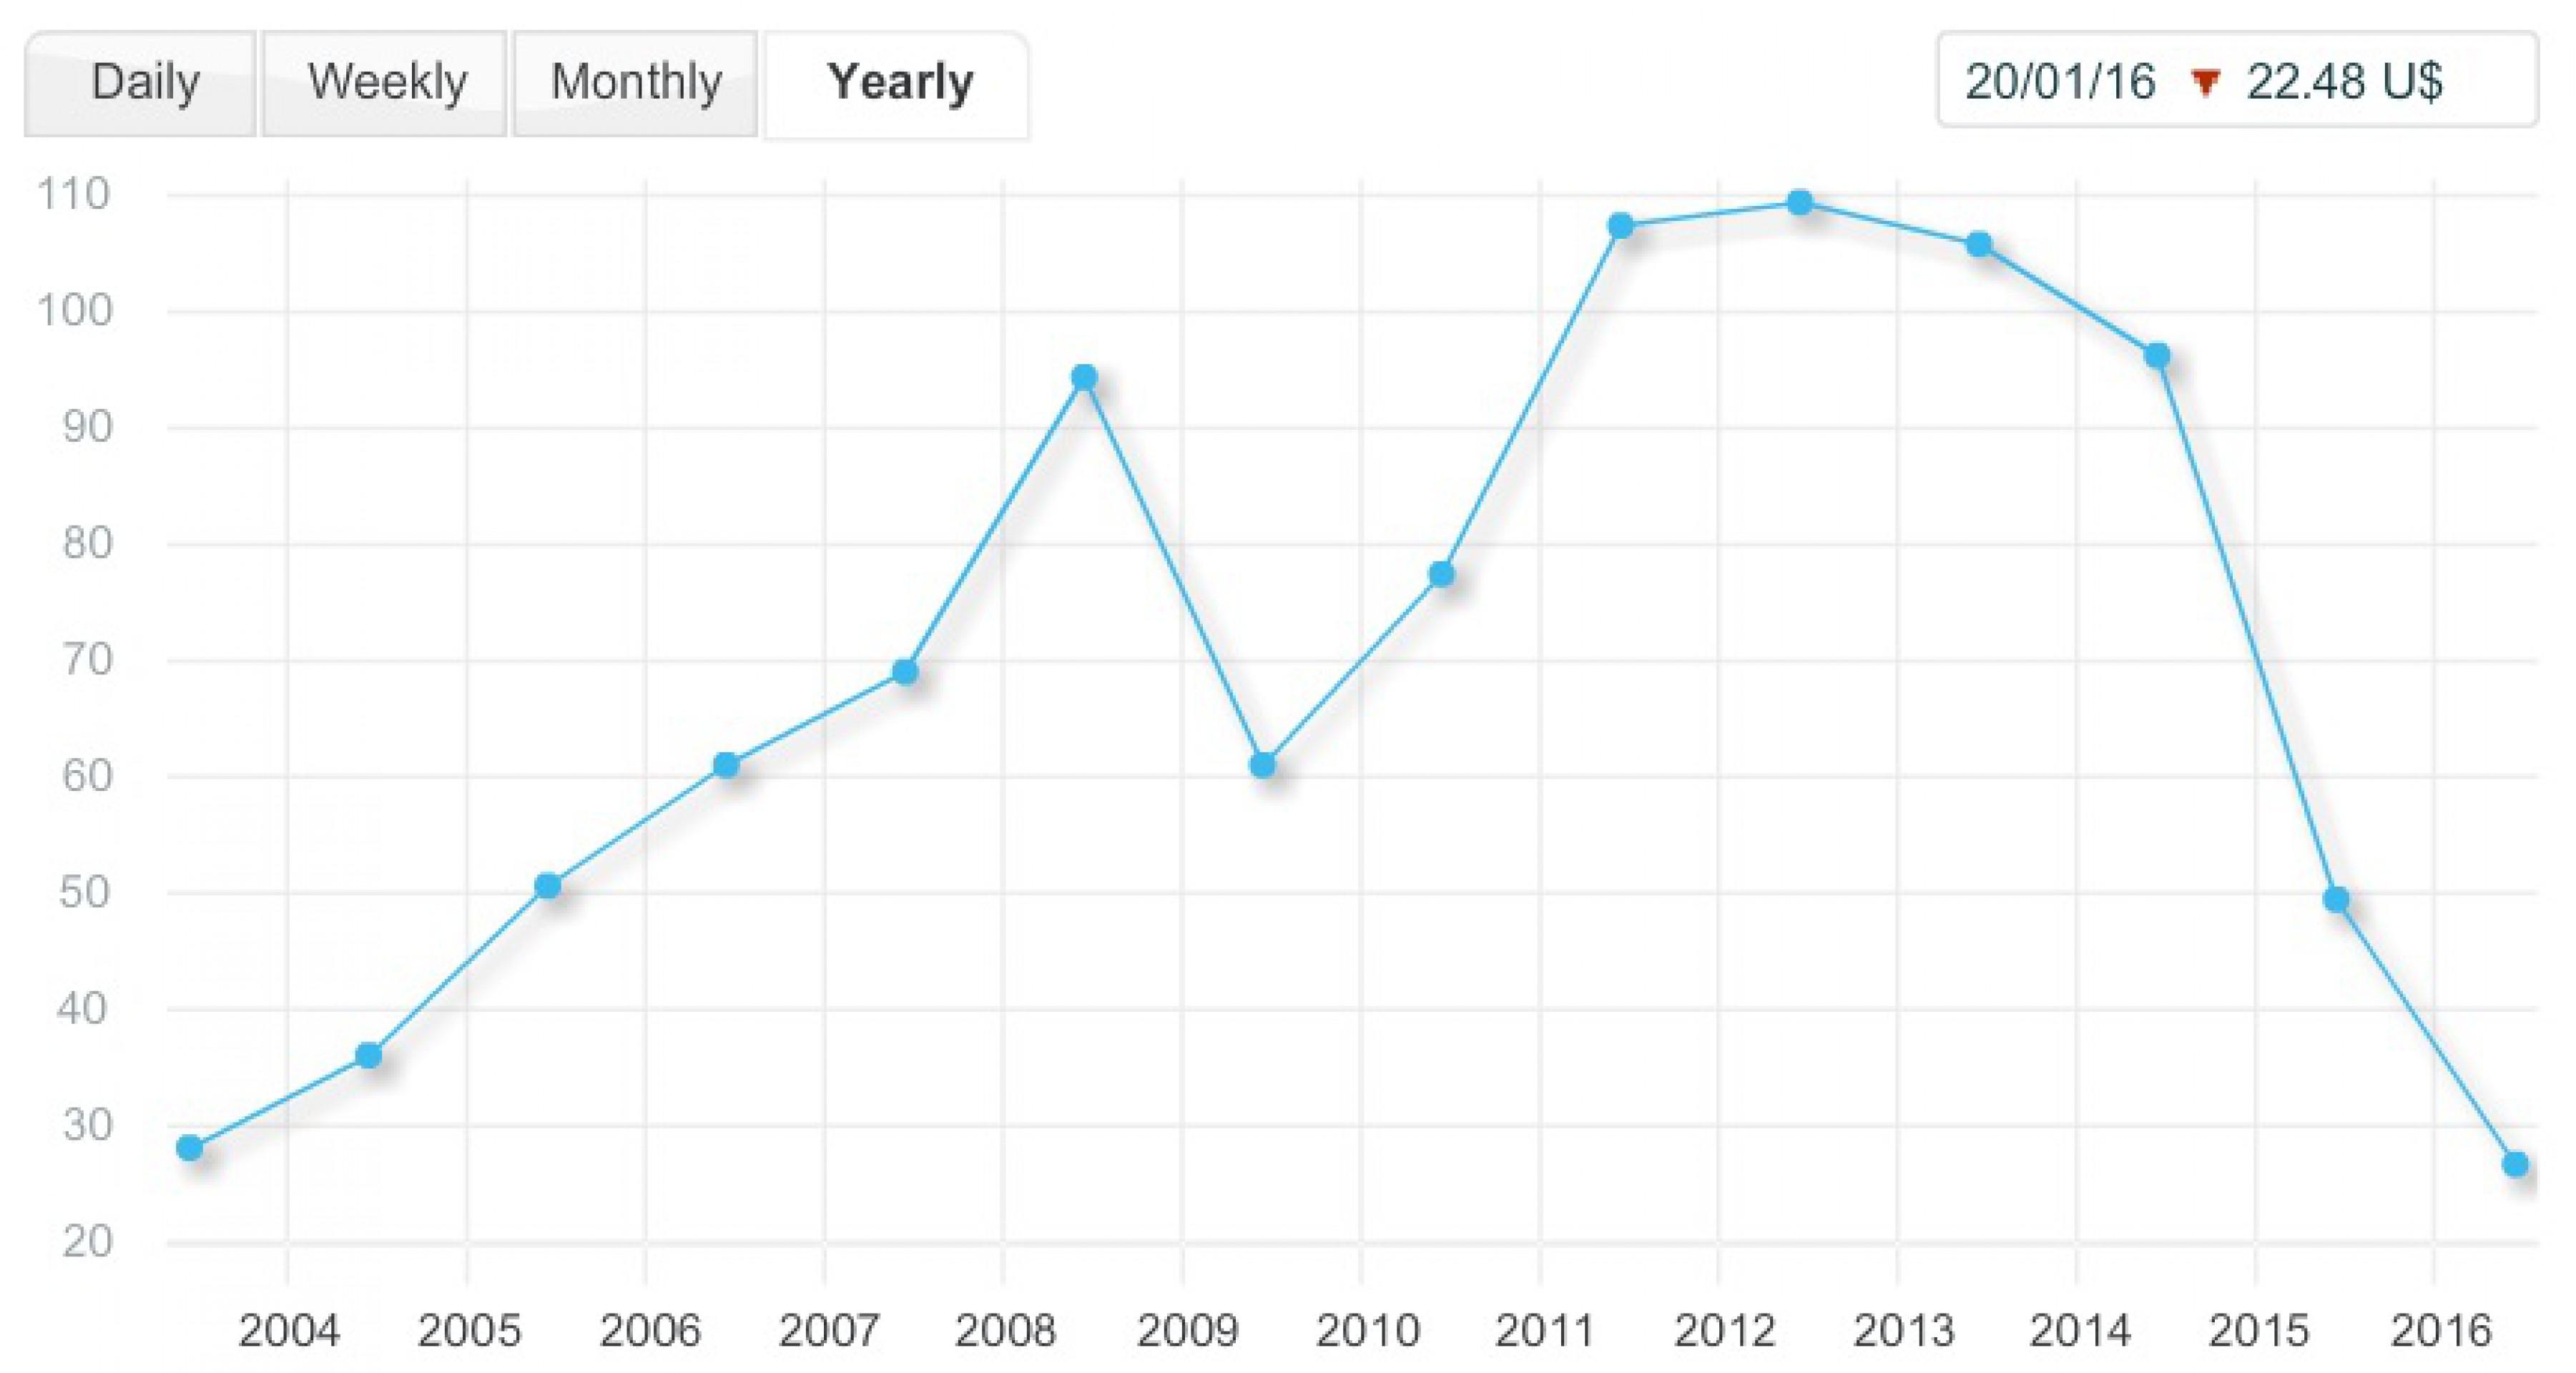 Нефтяная корзина ОПЕК упала до минимума за 14 лет